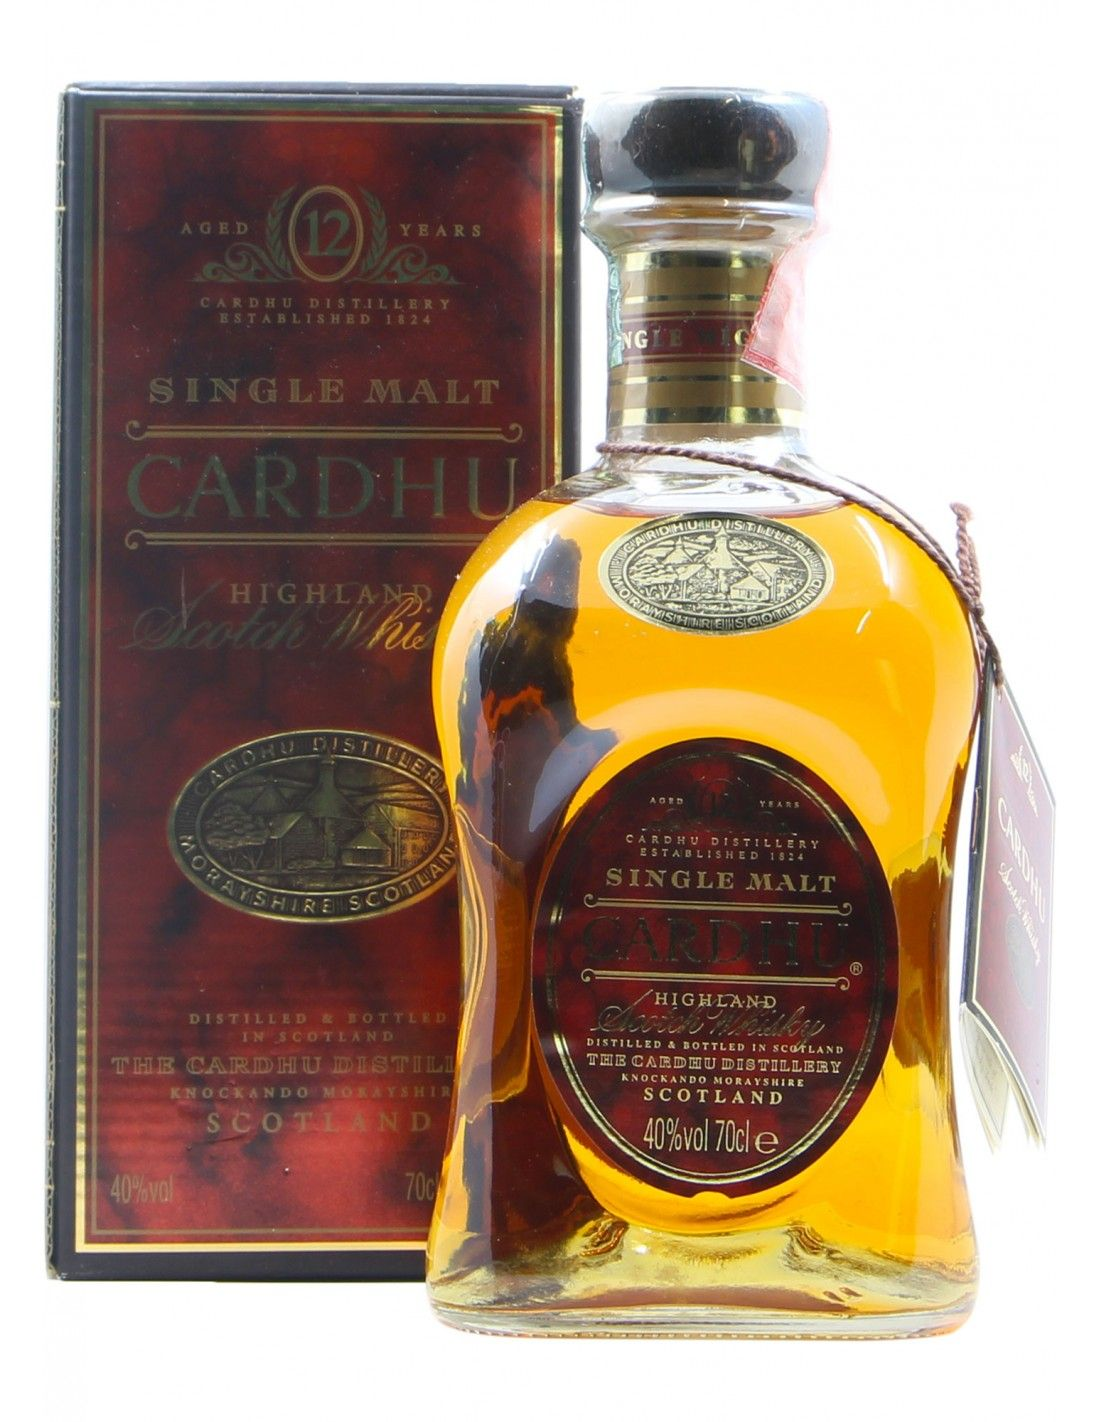 SCOTCH WHISKY AGES 12 YEARS 70 CL NV CARDHU Grandi Bottiglie